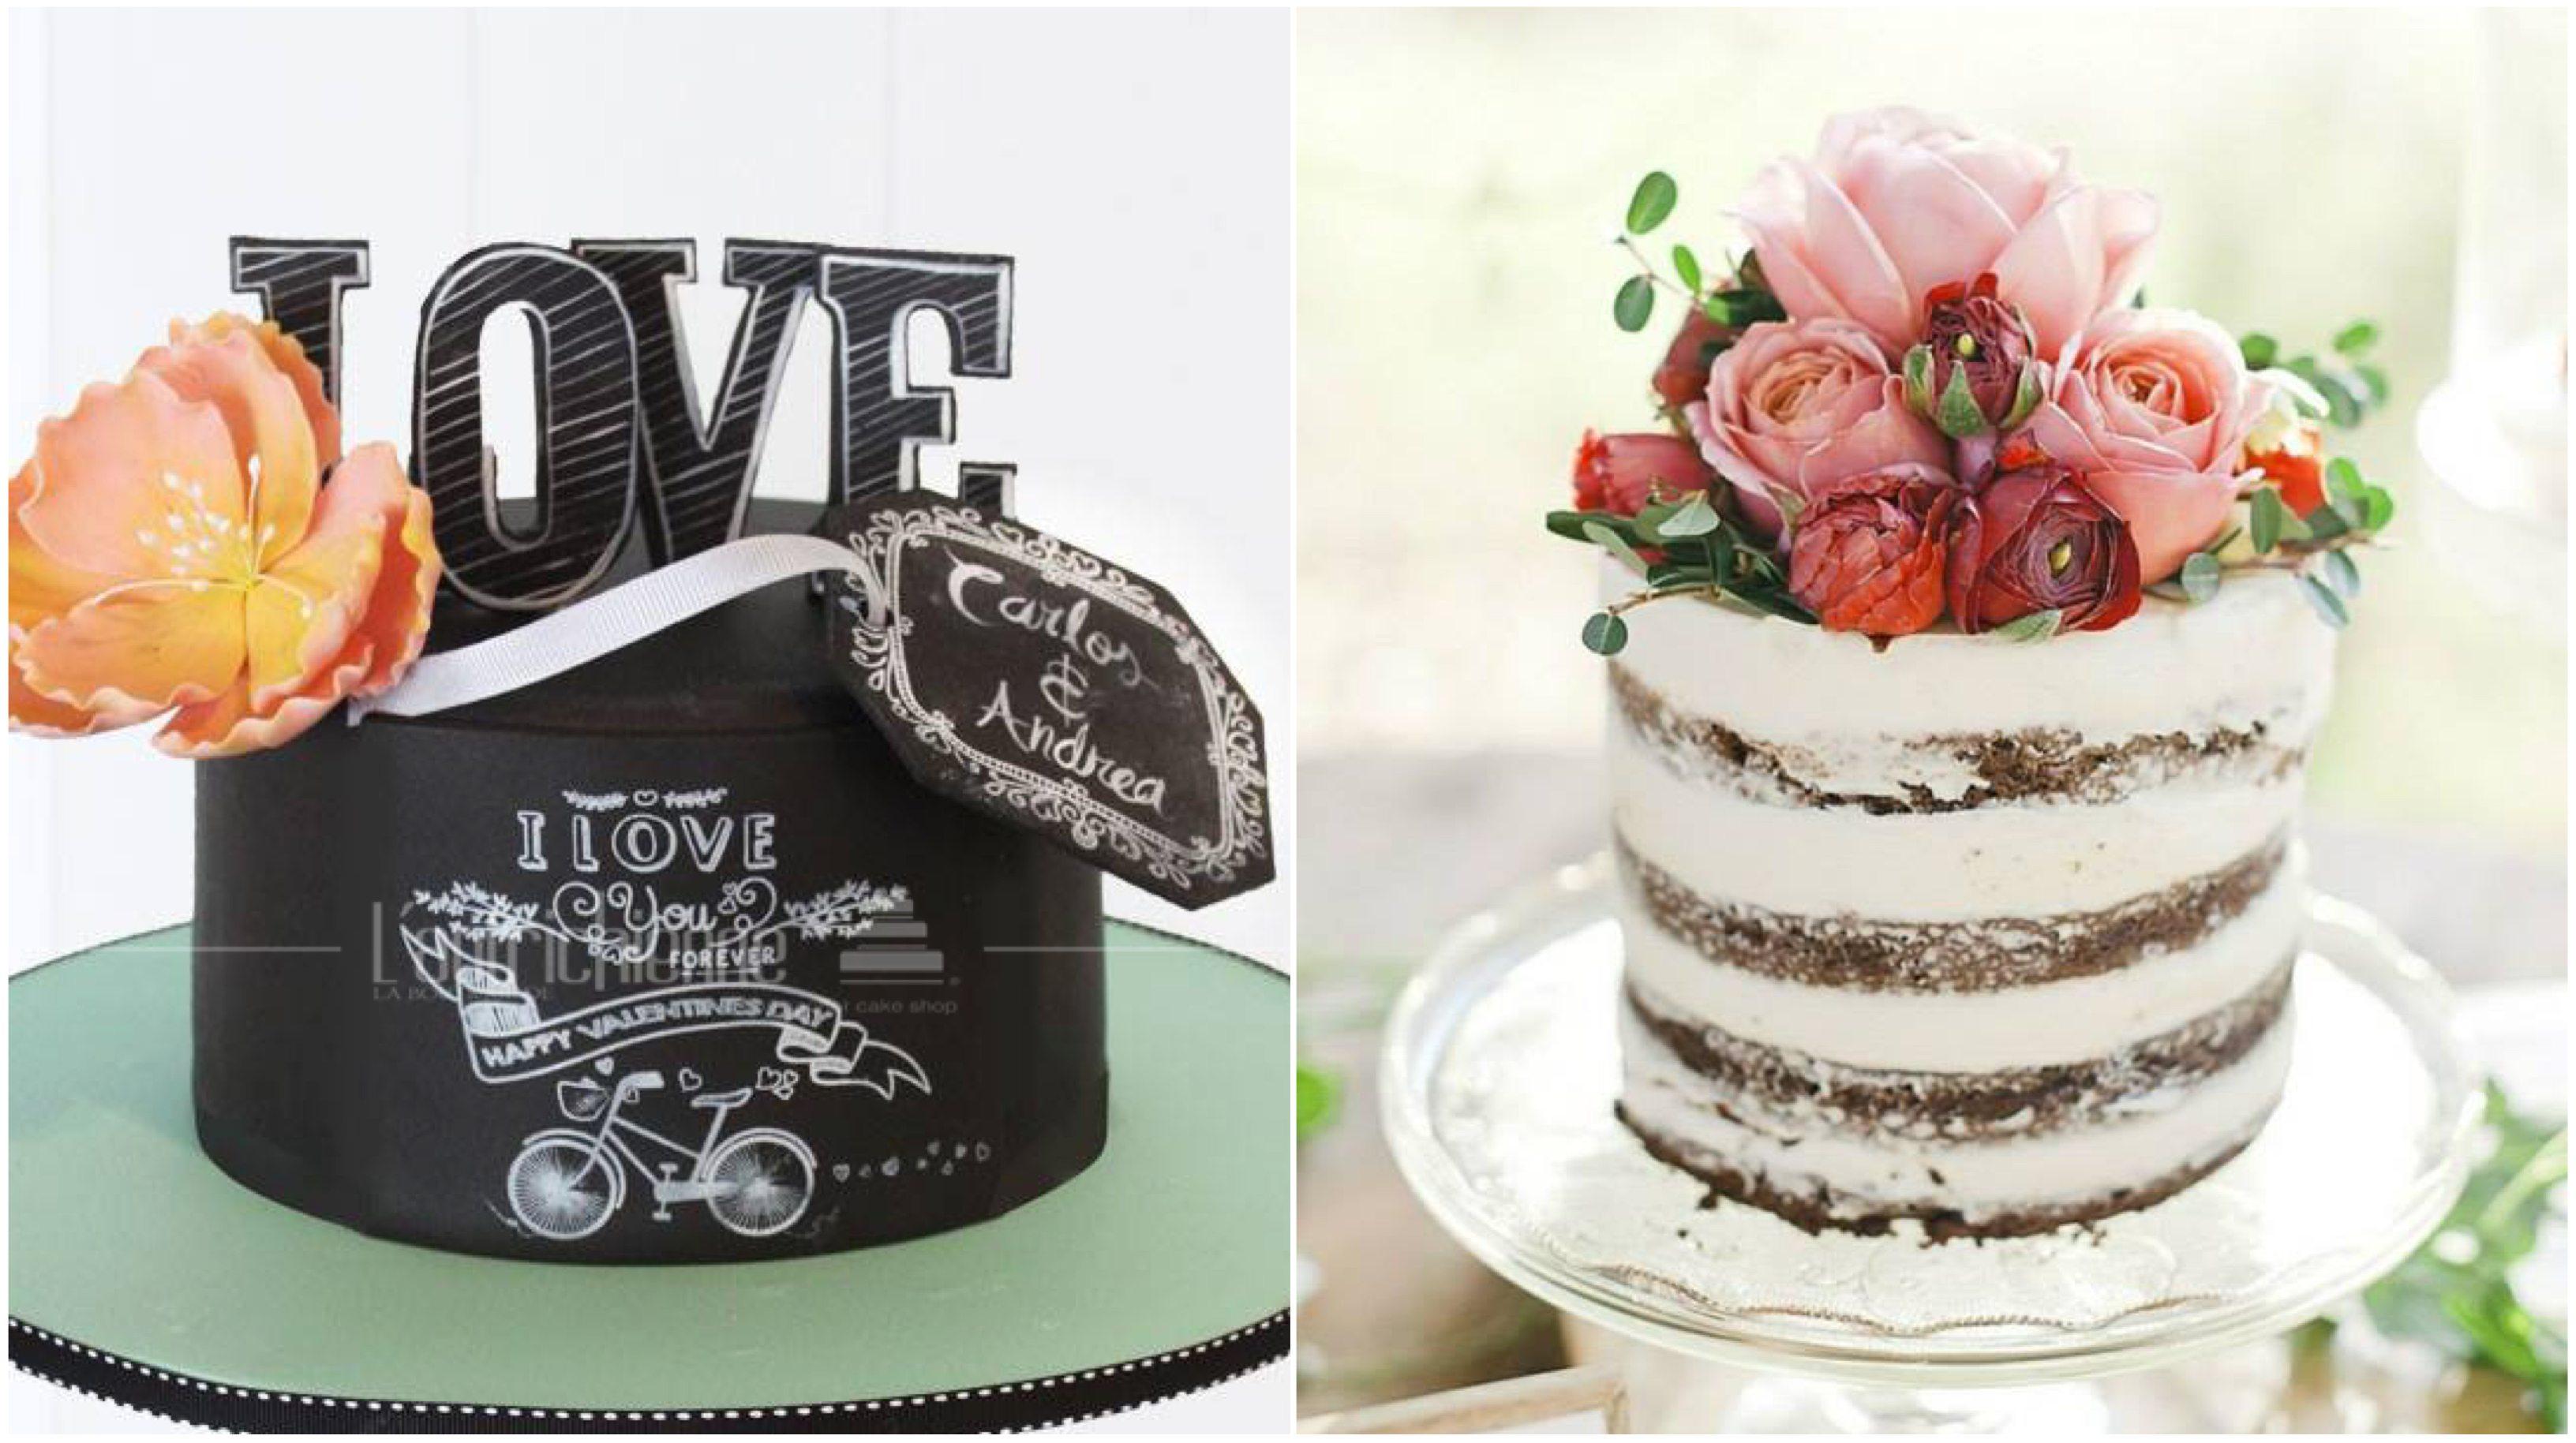 Tendencia en pasteles para bodas 2017 quiero mi fiesta for Tendencias de bodas 2017